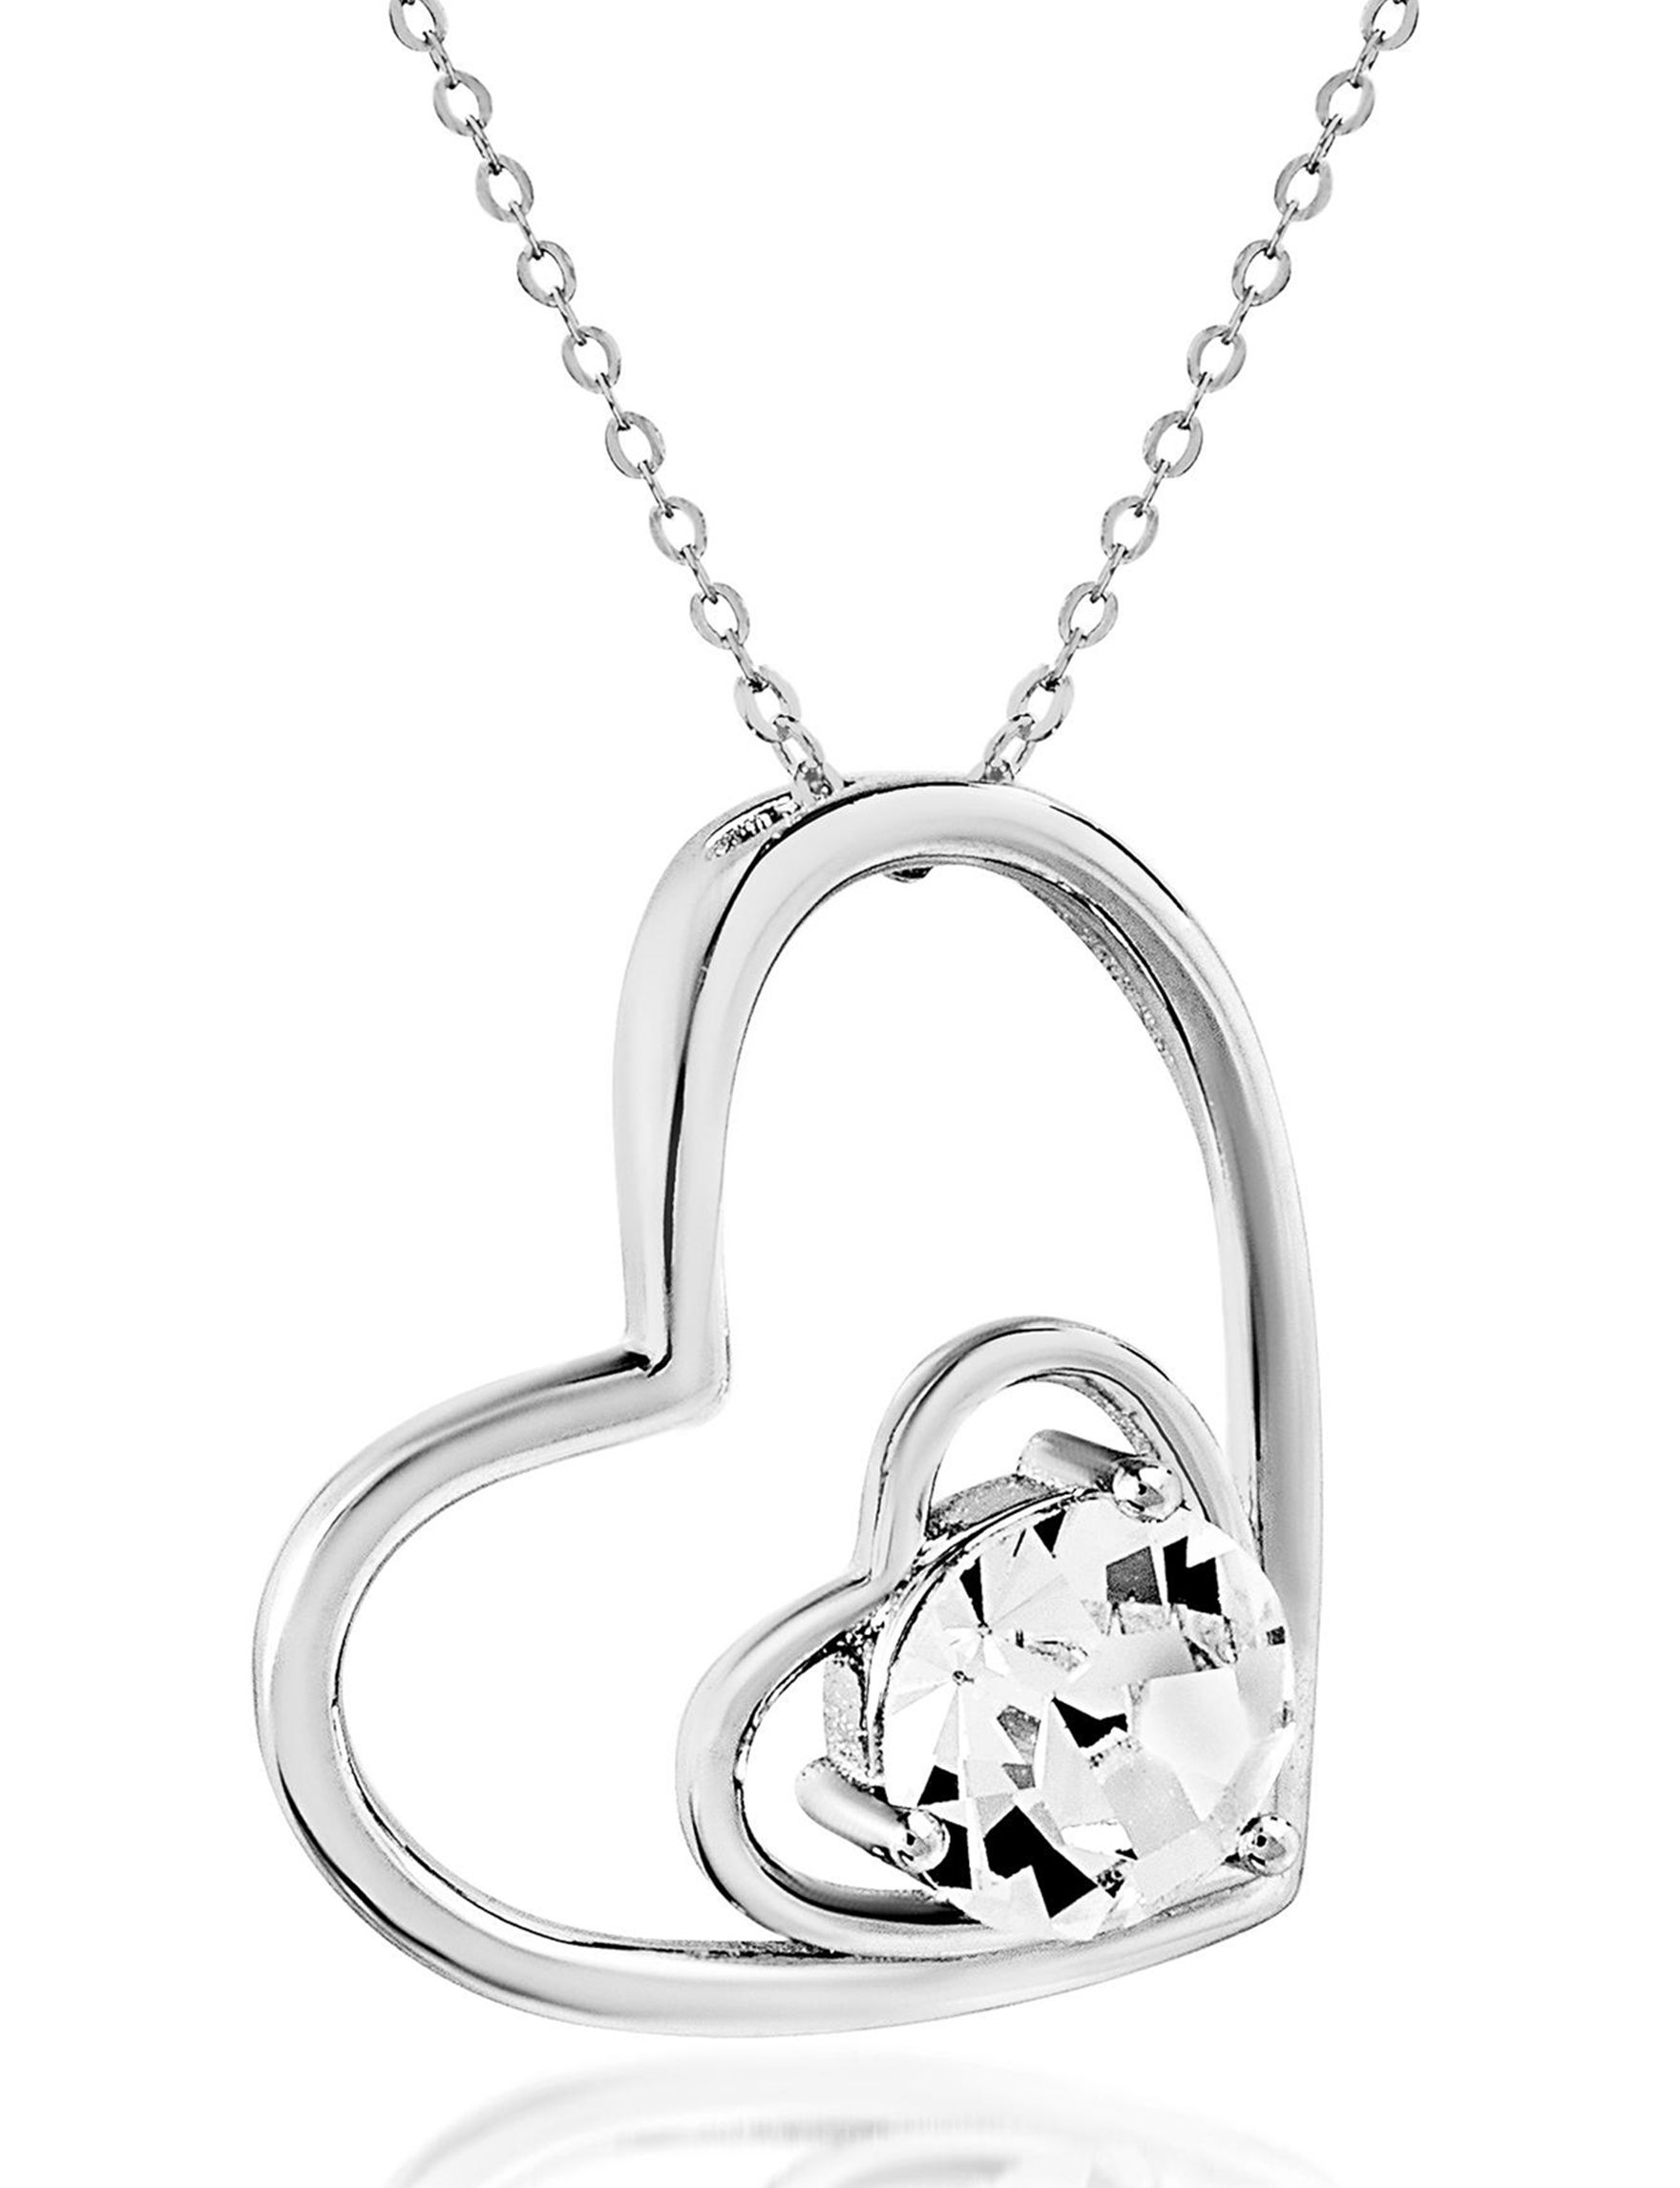 NES Silver Necklaces & Pendants Fine Jewelry